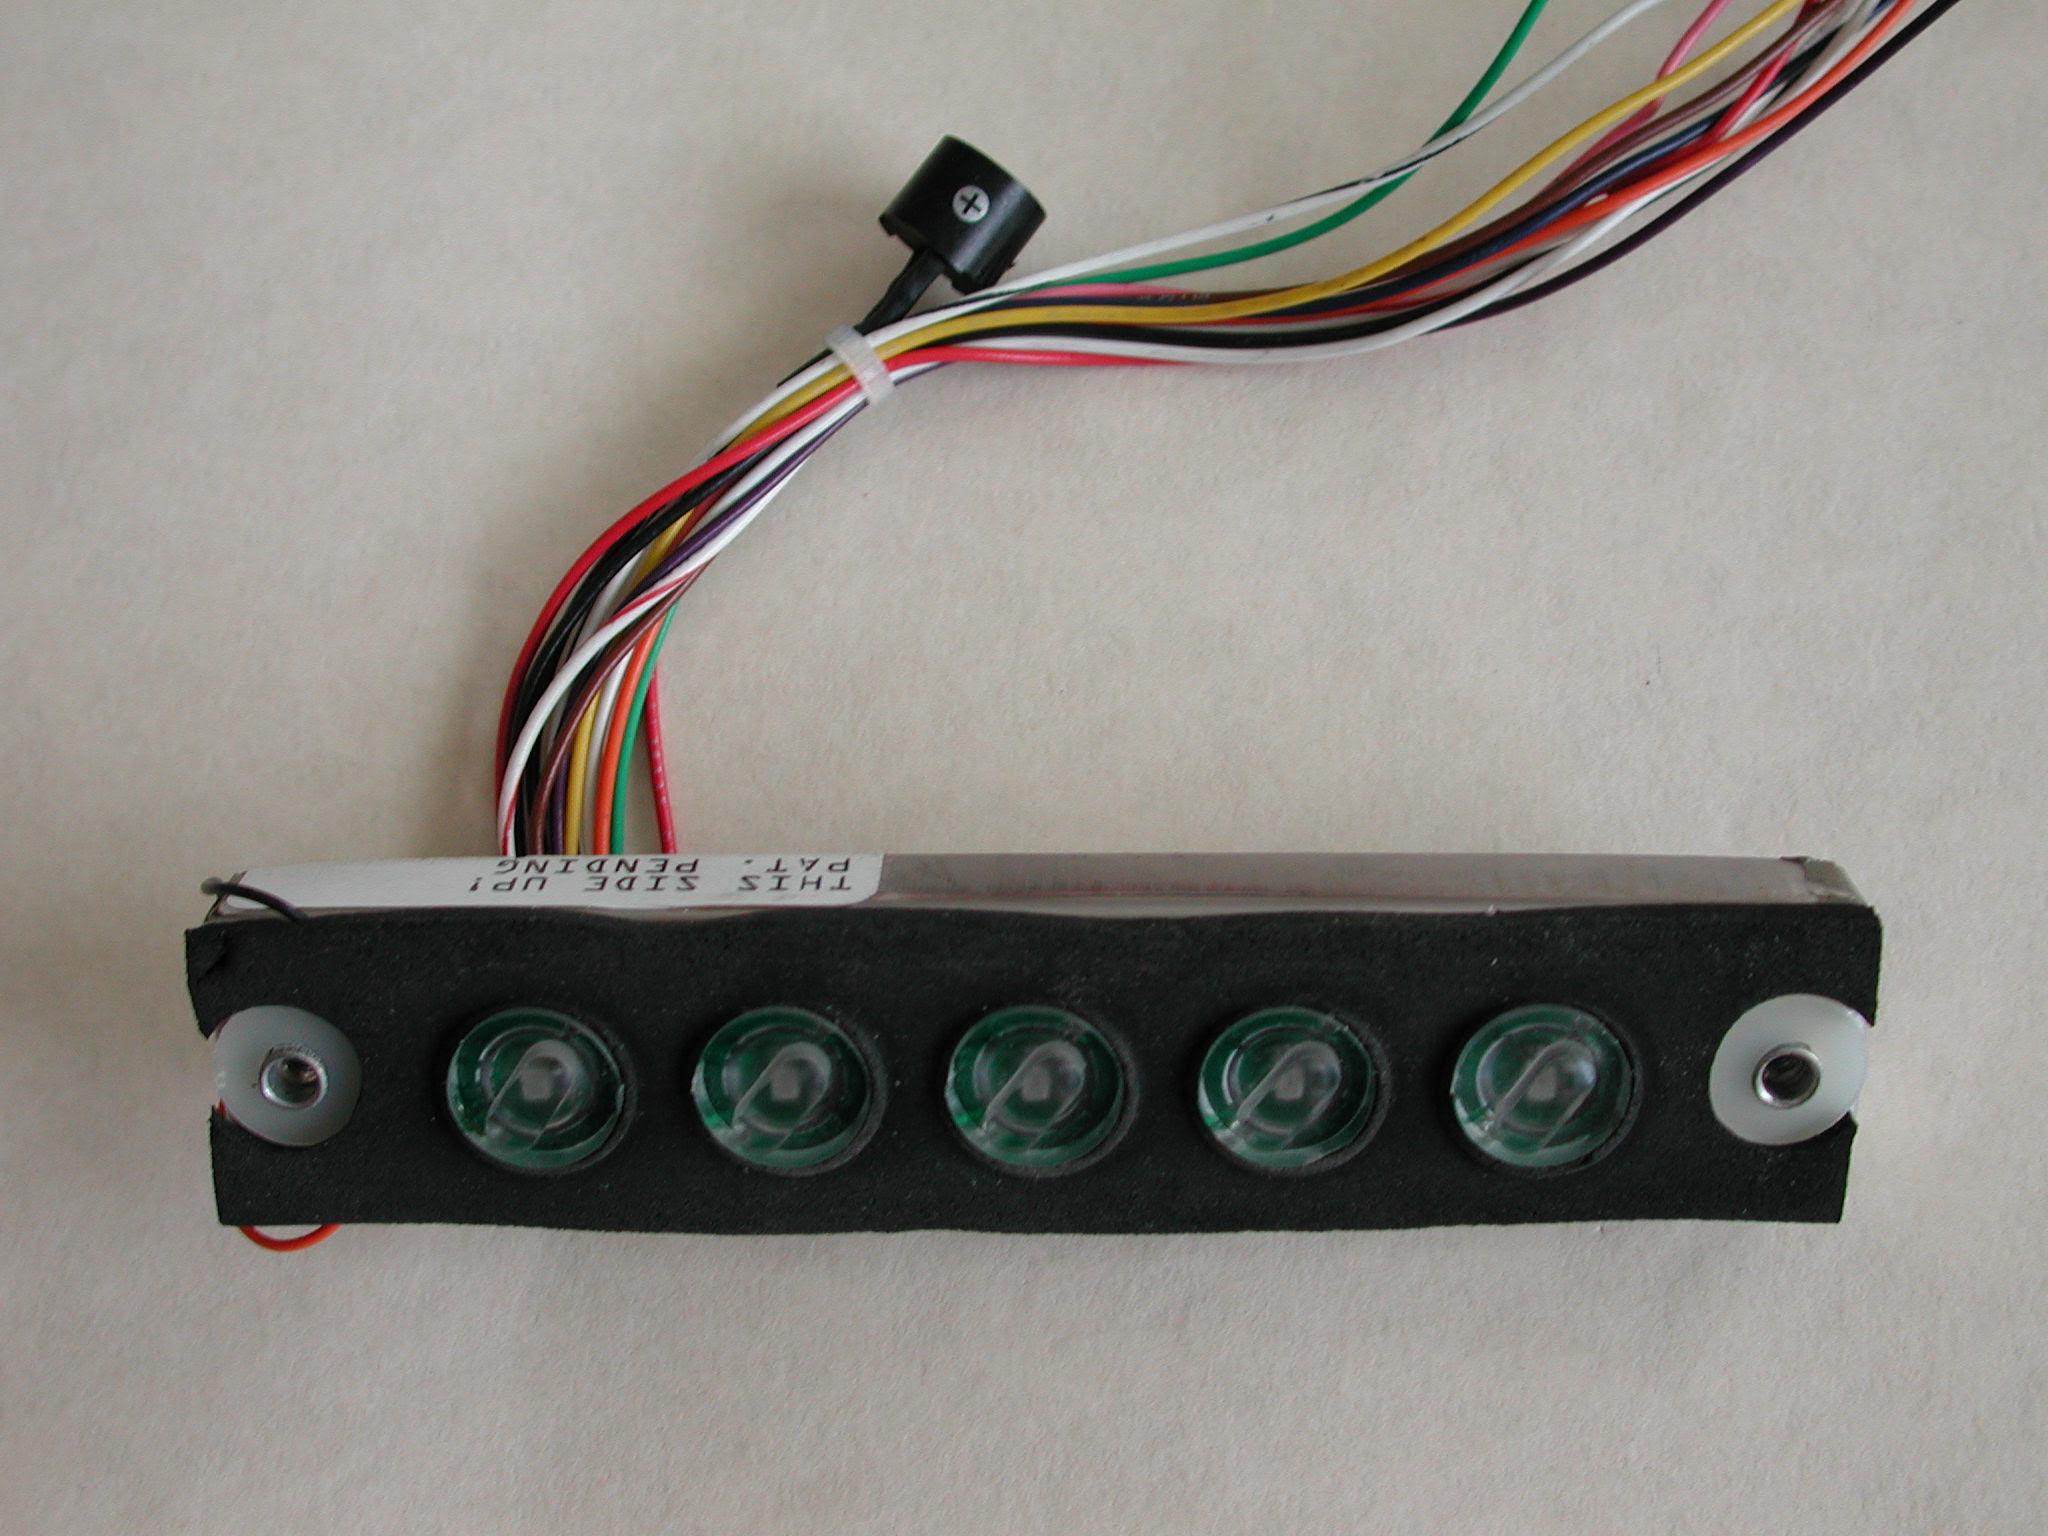 B0bf57a Ford Edge Keypad Wiring Diagram Wiring Resources